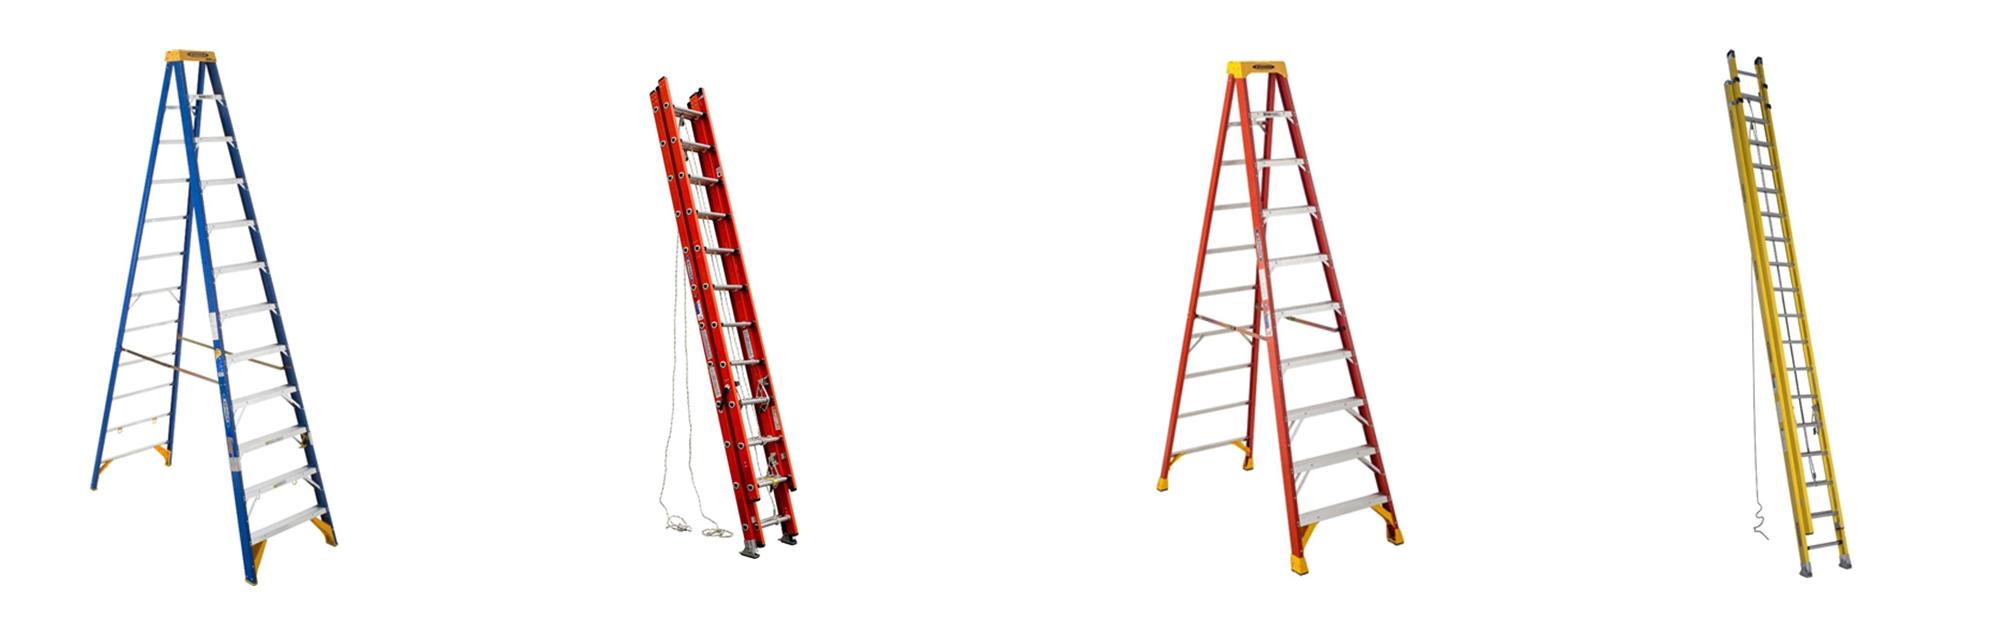 Stage Guardrail Scaffold Tower Ladder Rentals In Michigan